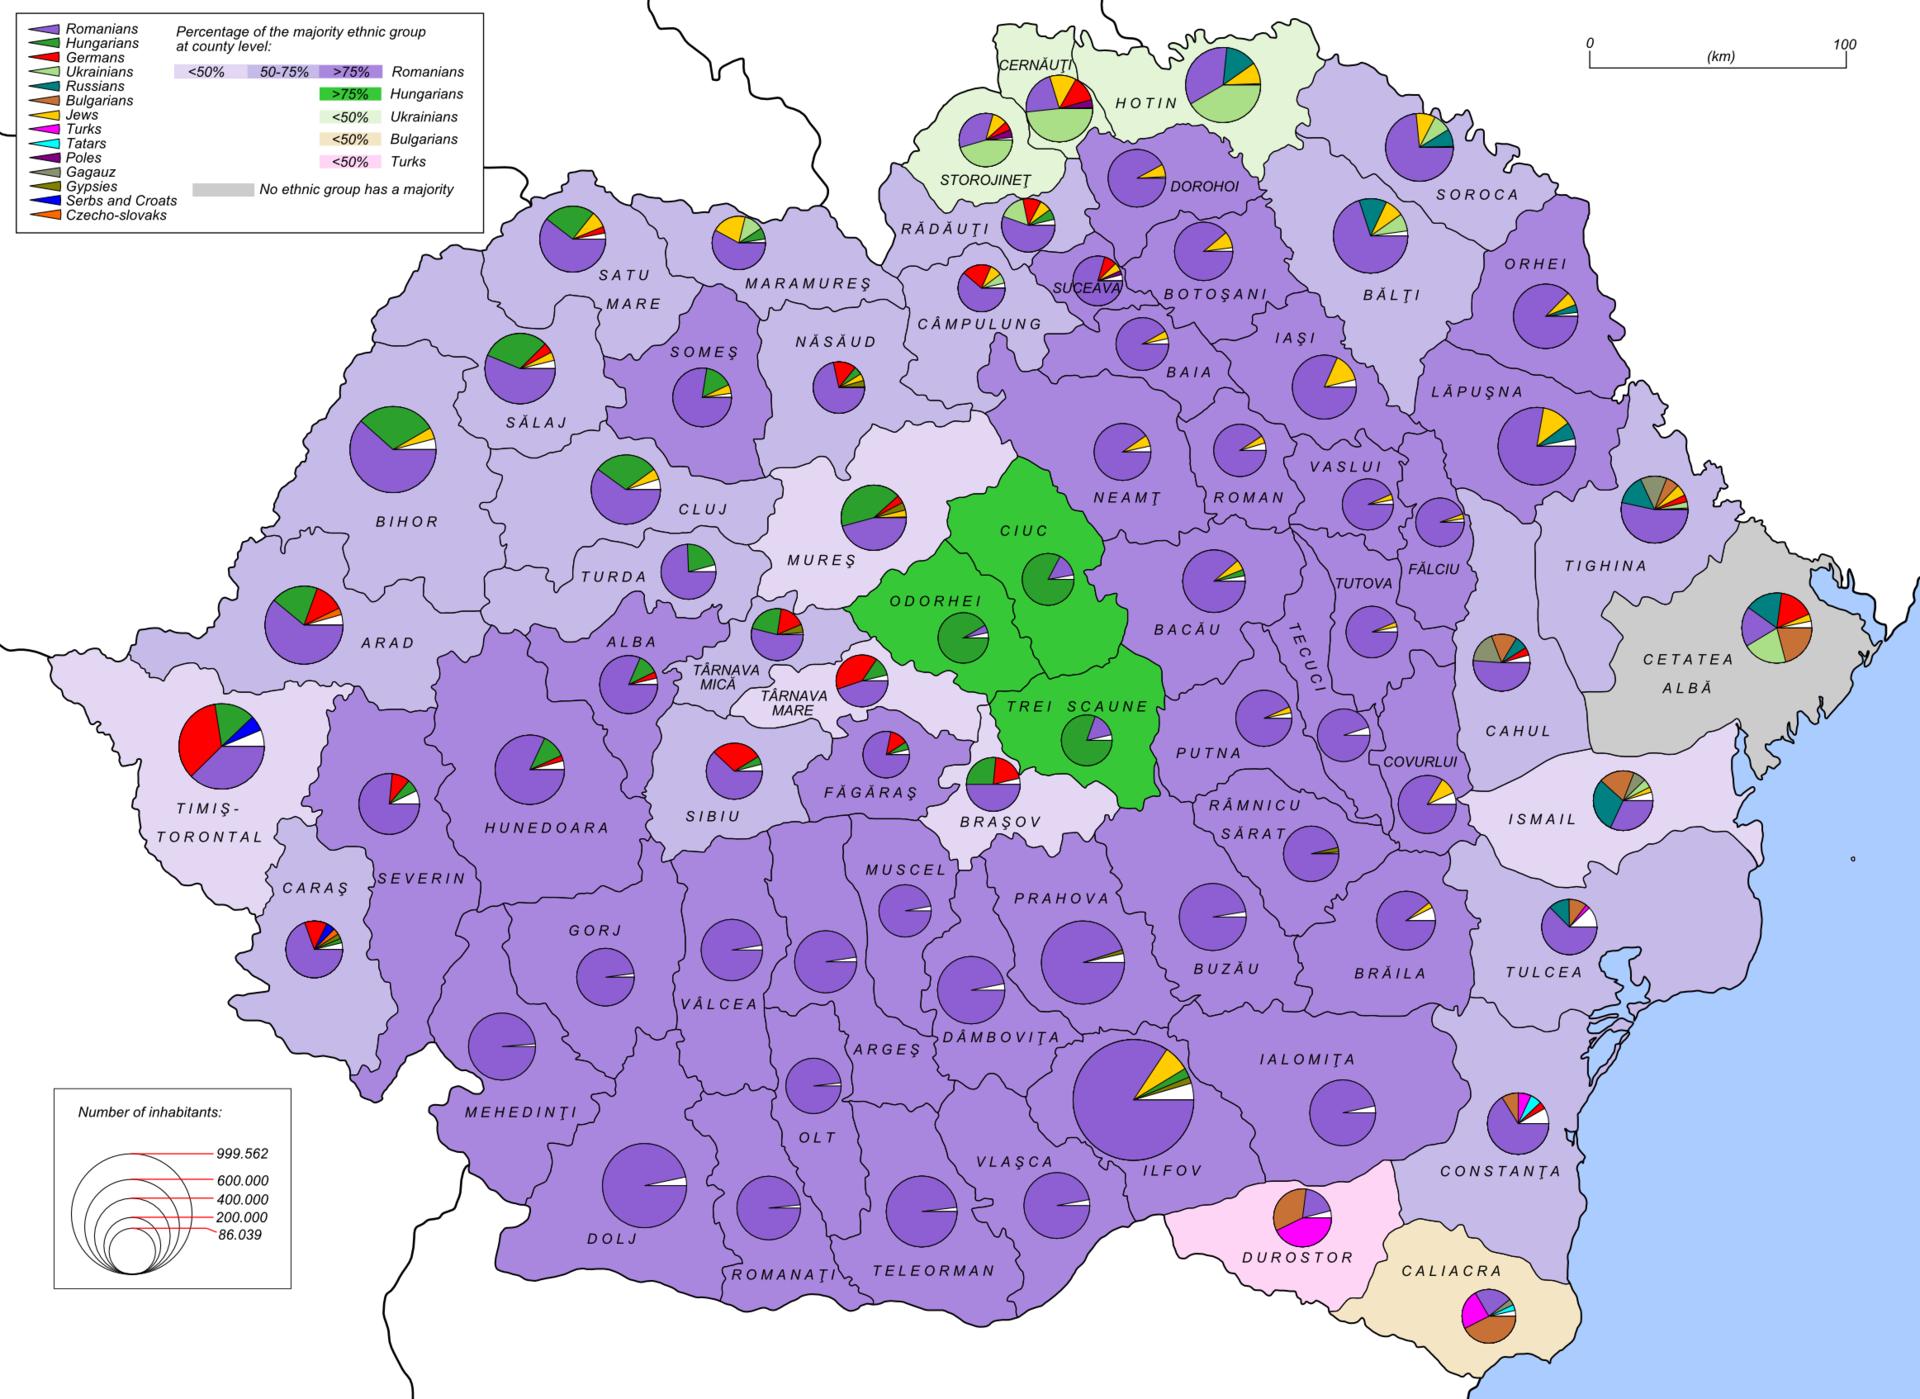 Romania 1930 ethnic map EN - Bessarabia - Wikipedia | Maps